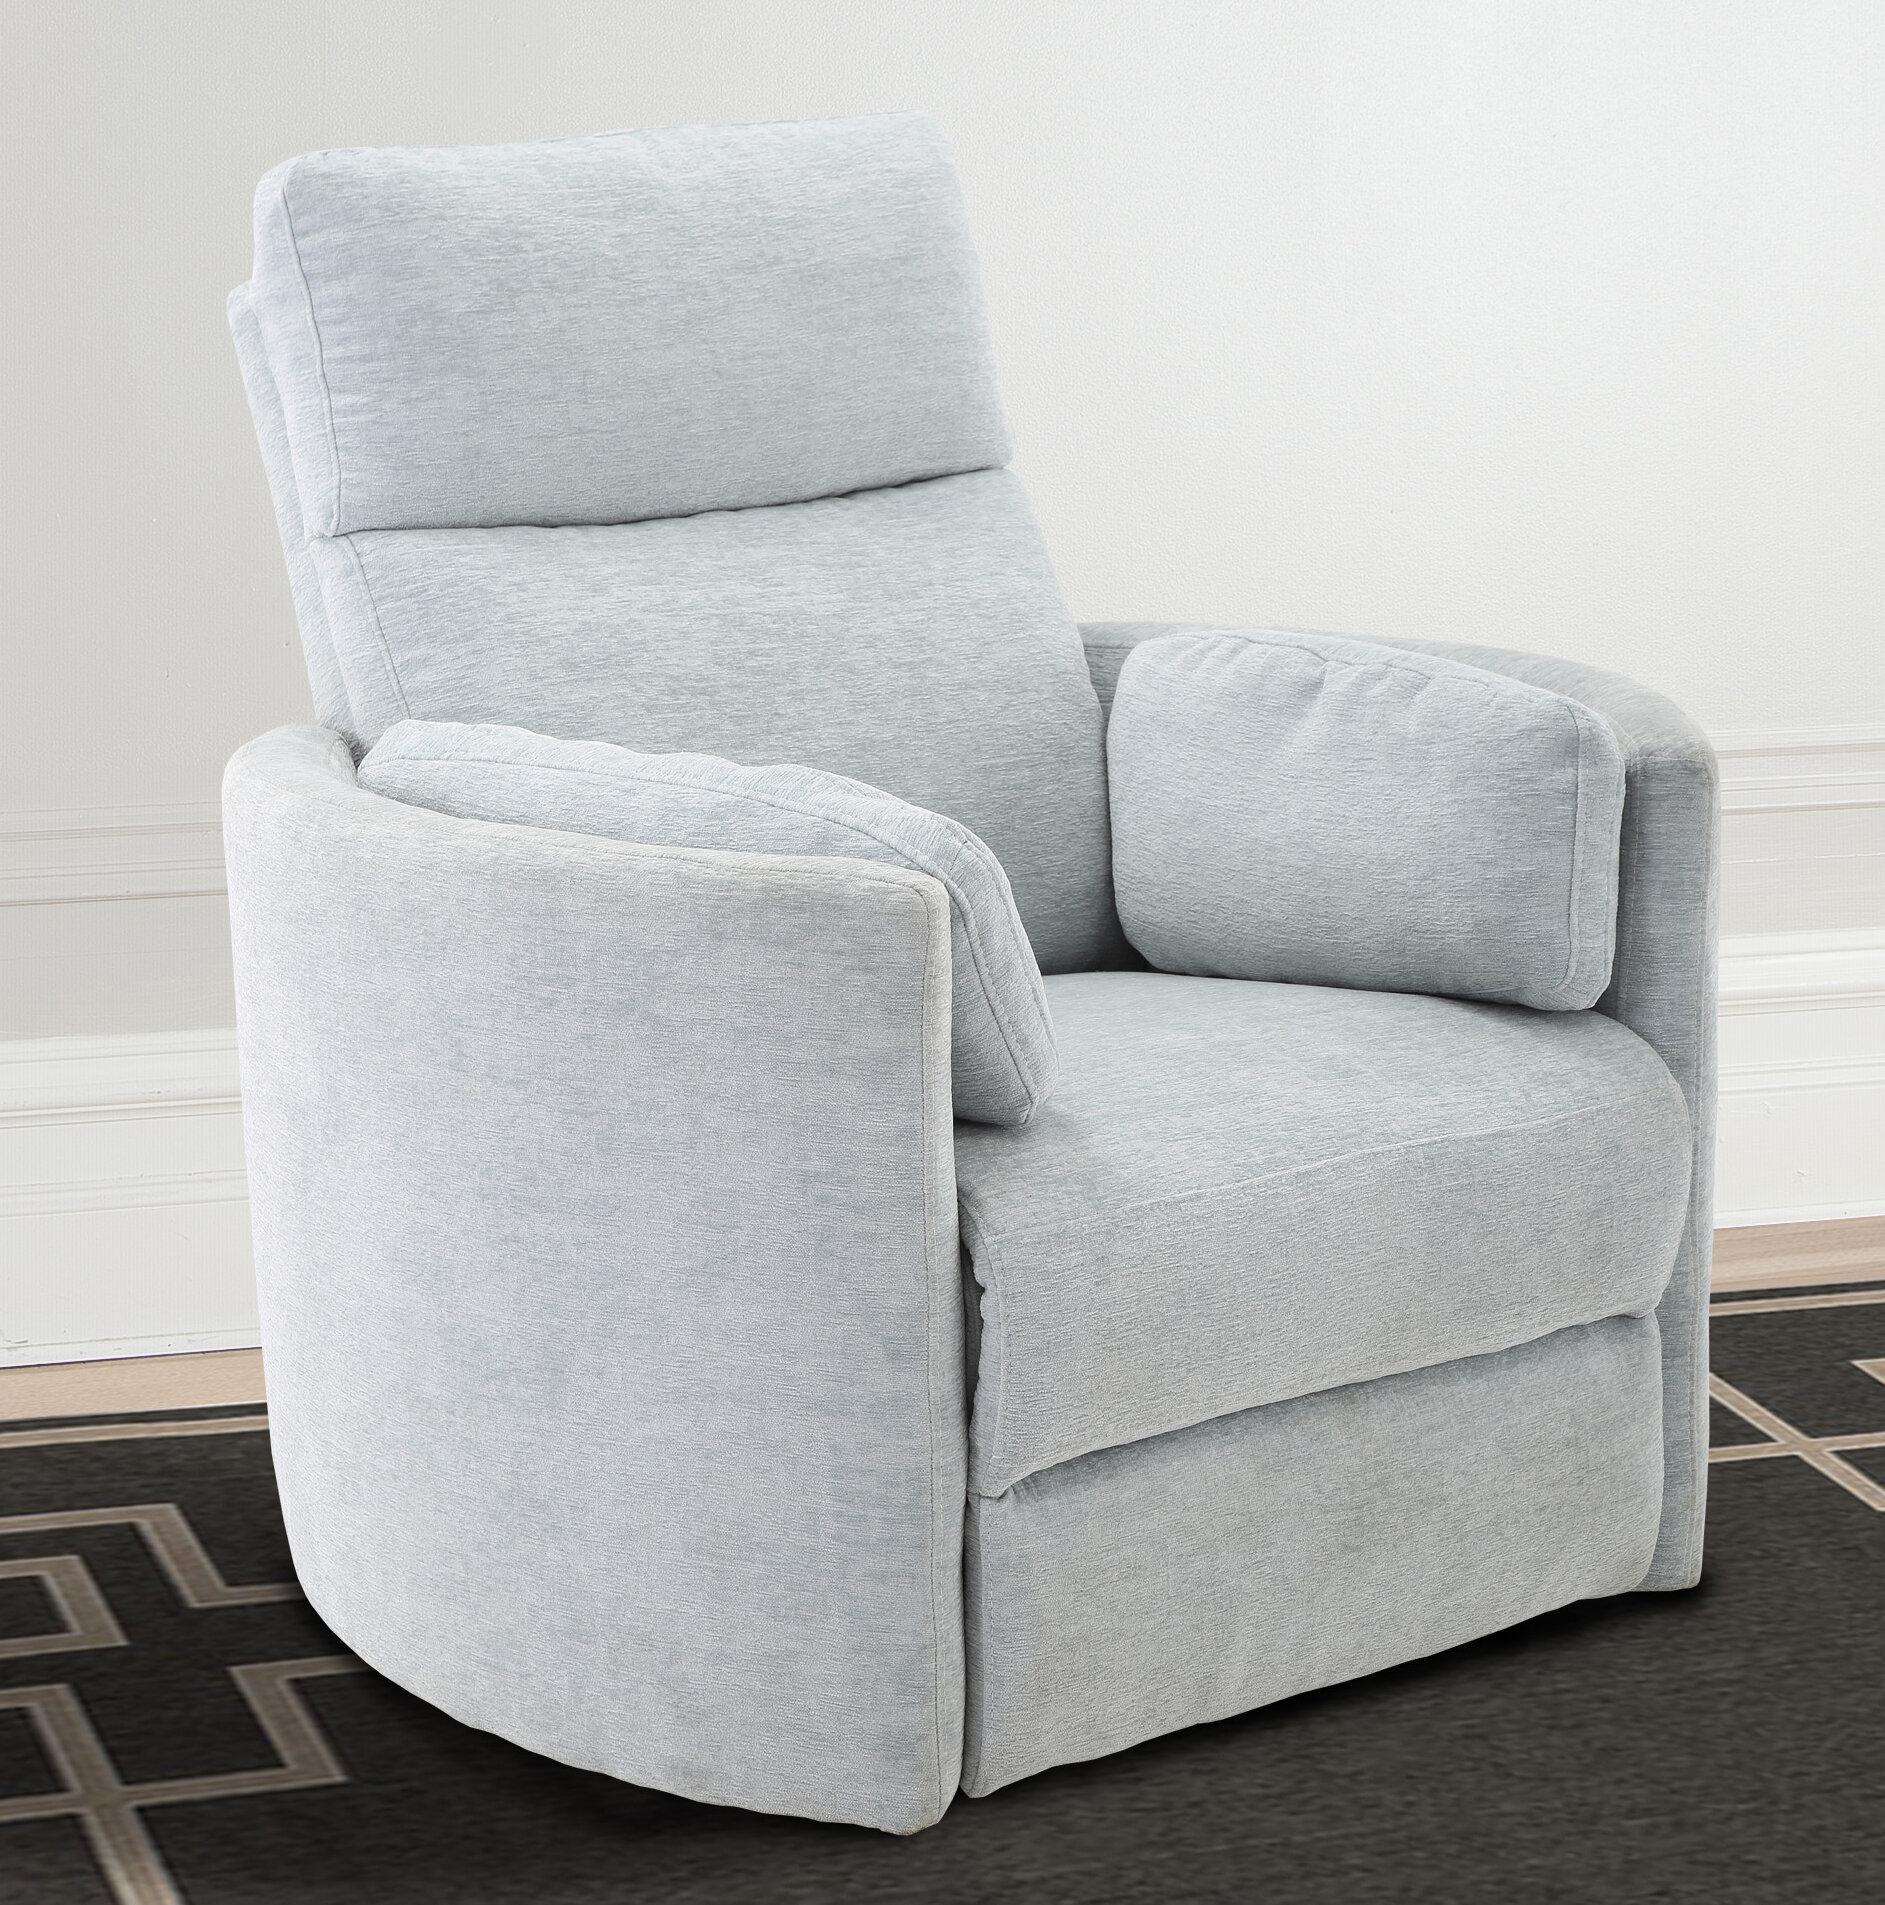 Groovy Isabeau Power Glider Swivel Recliner Alphanode Cool Chair Designs And Ideas Alphanodeonline